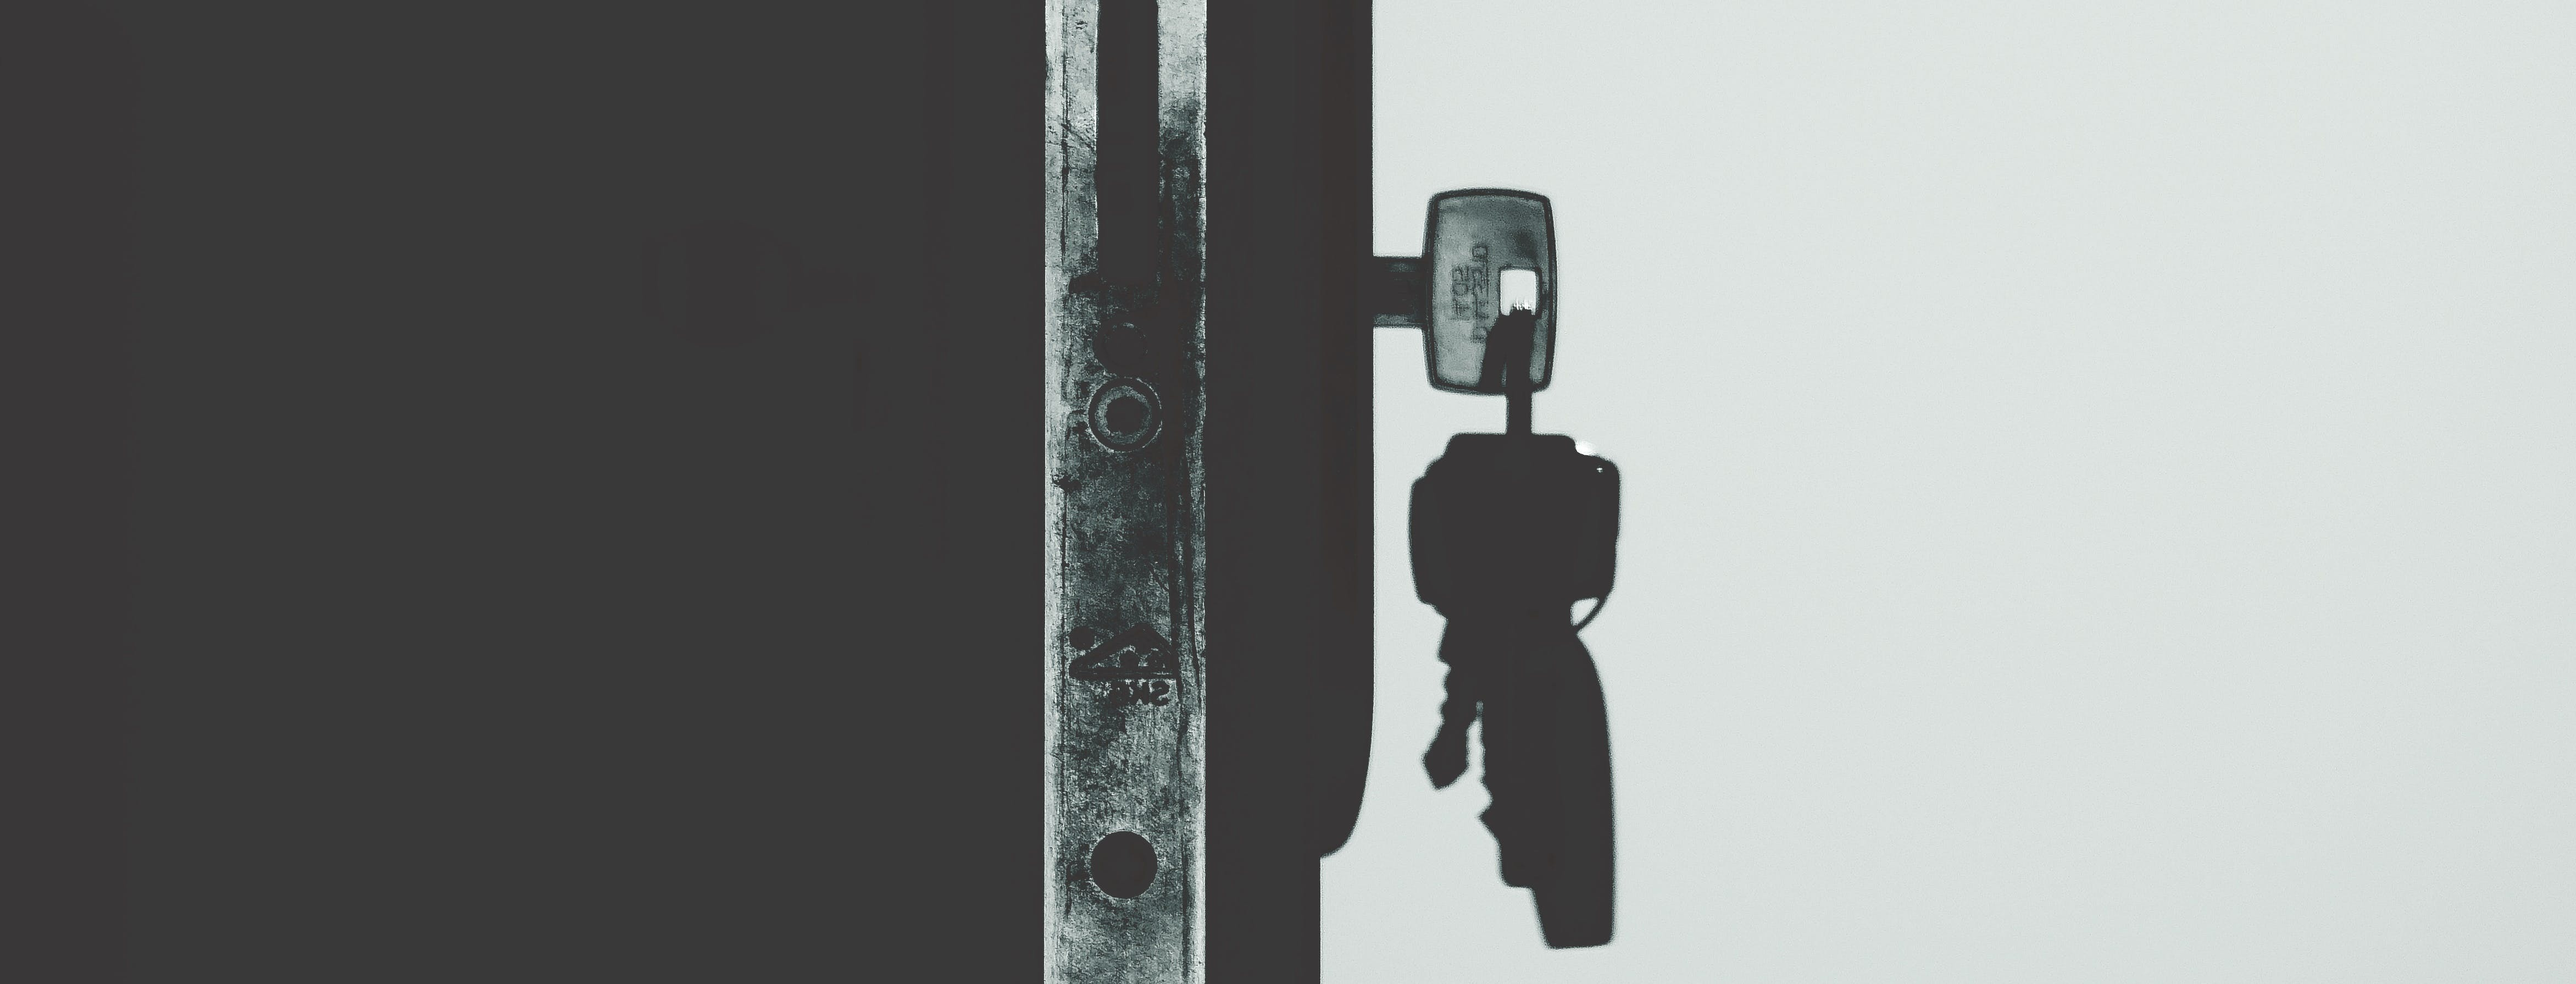 Monochrome Photography of Keys · Free Stock Photo